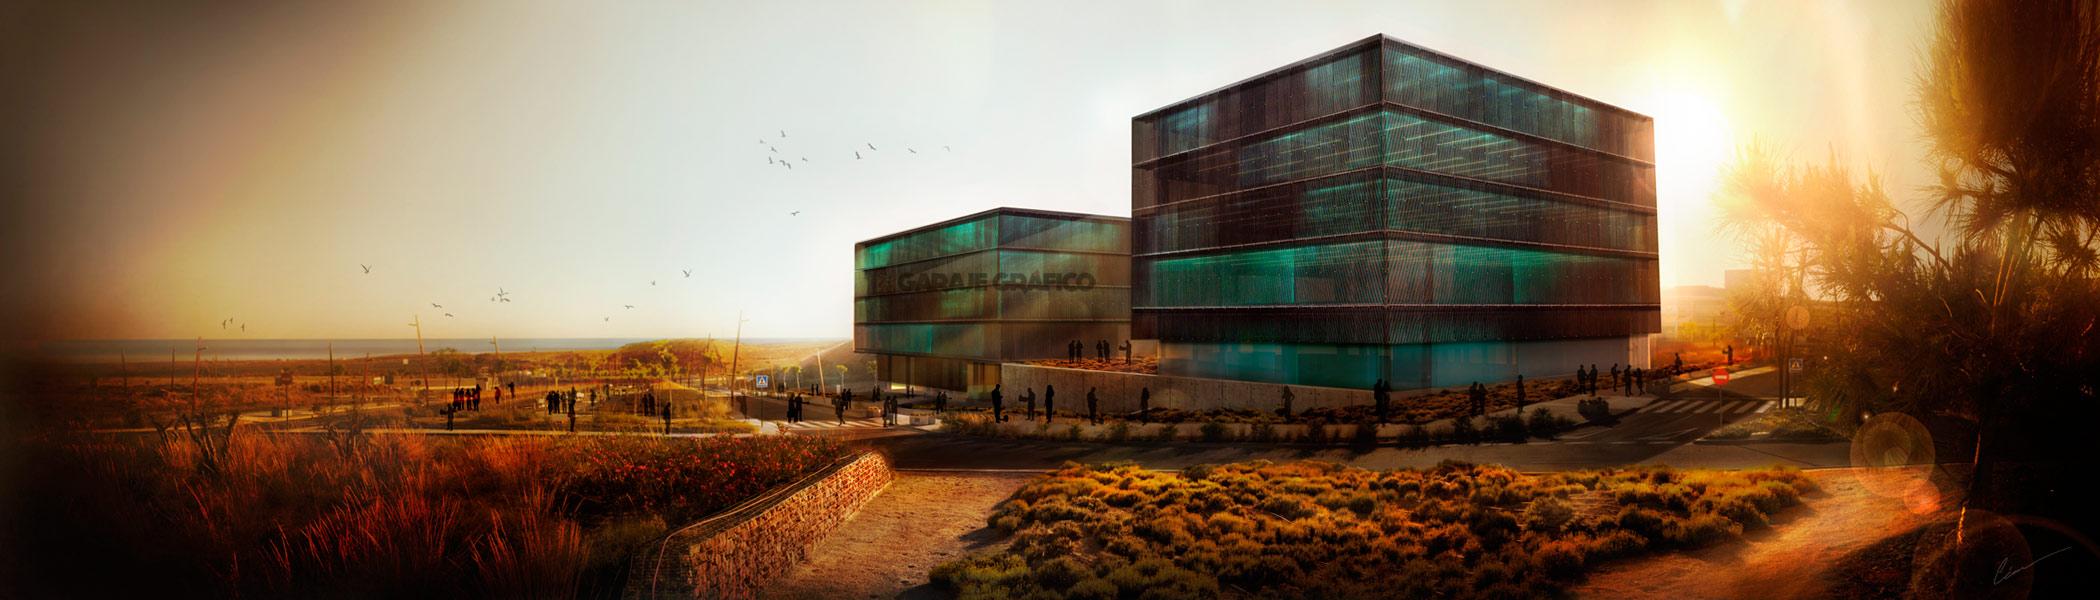 concurso de arquitectura 3d garaje grafico